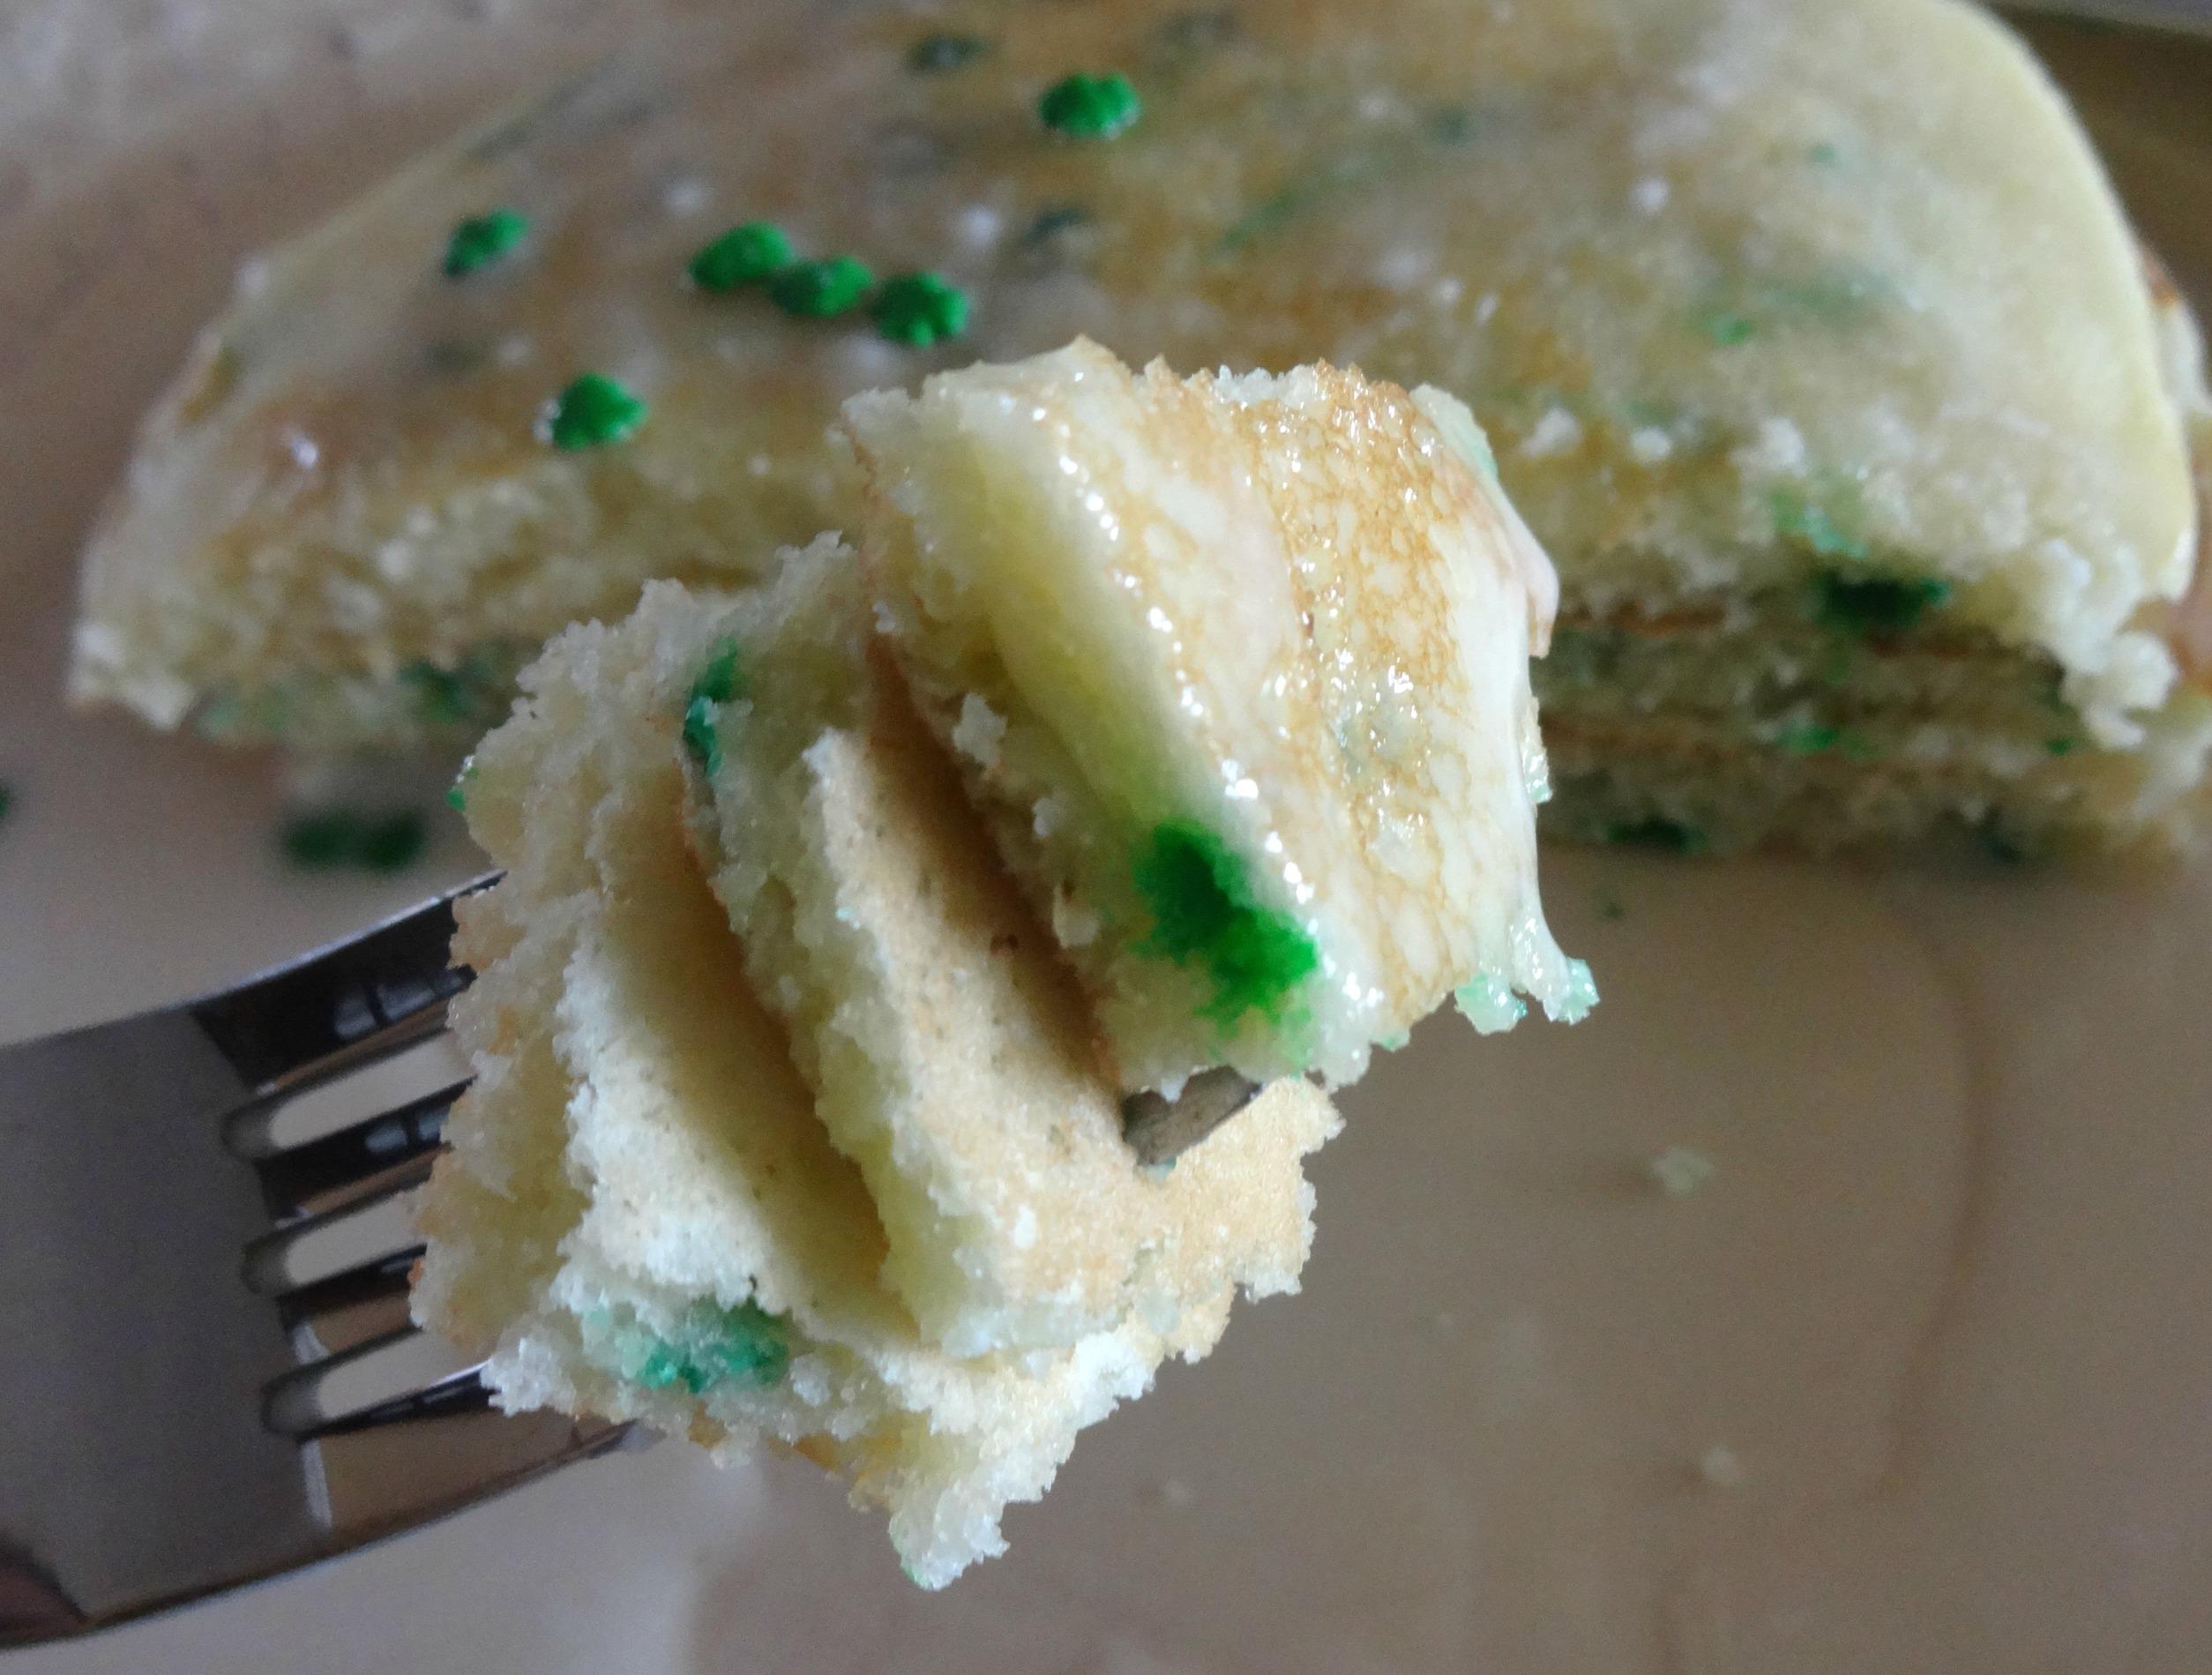 Birthday Cake Pancakes with Homemade Cake Batter Serendipity